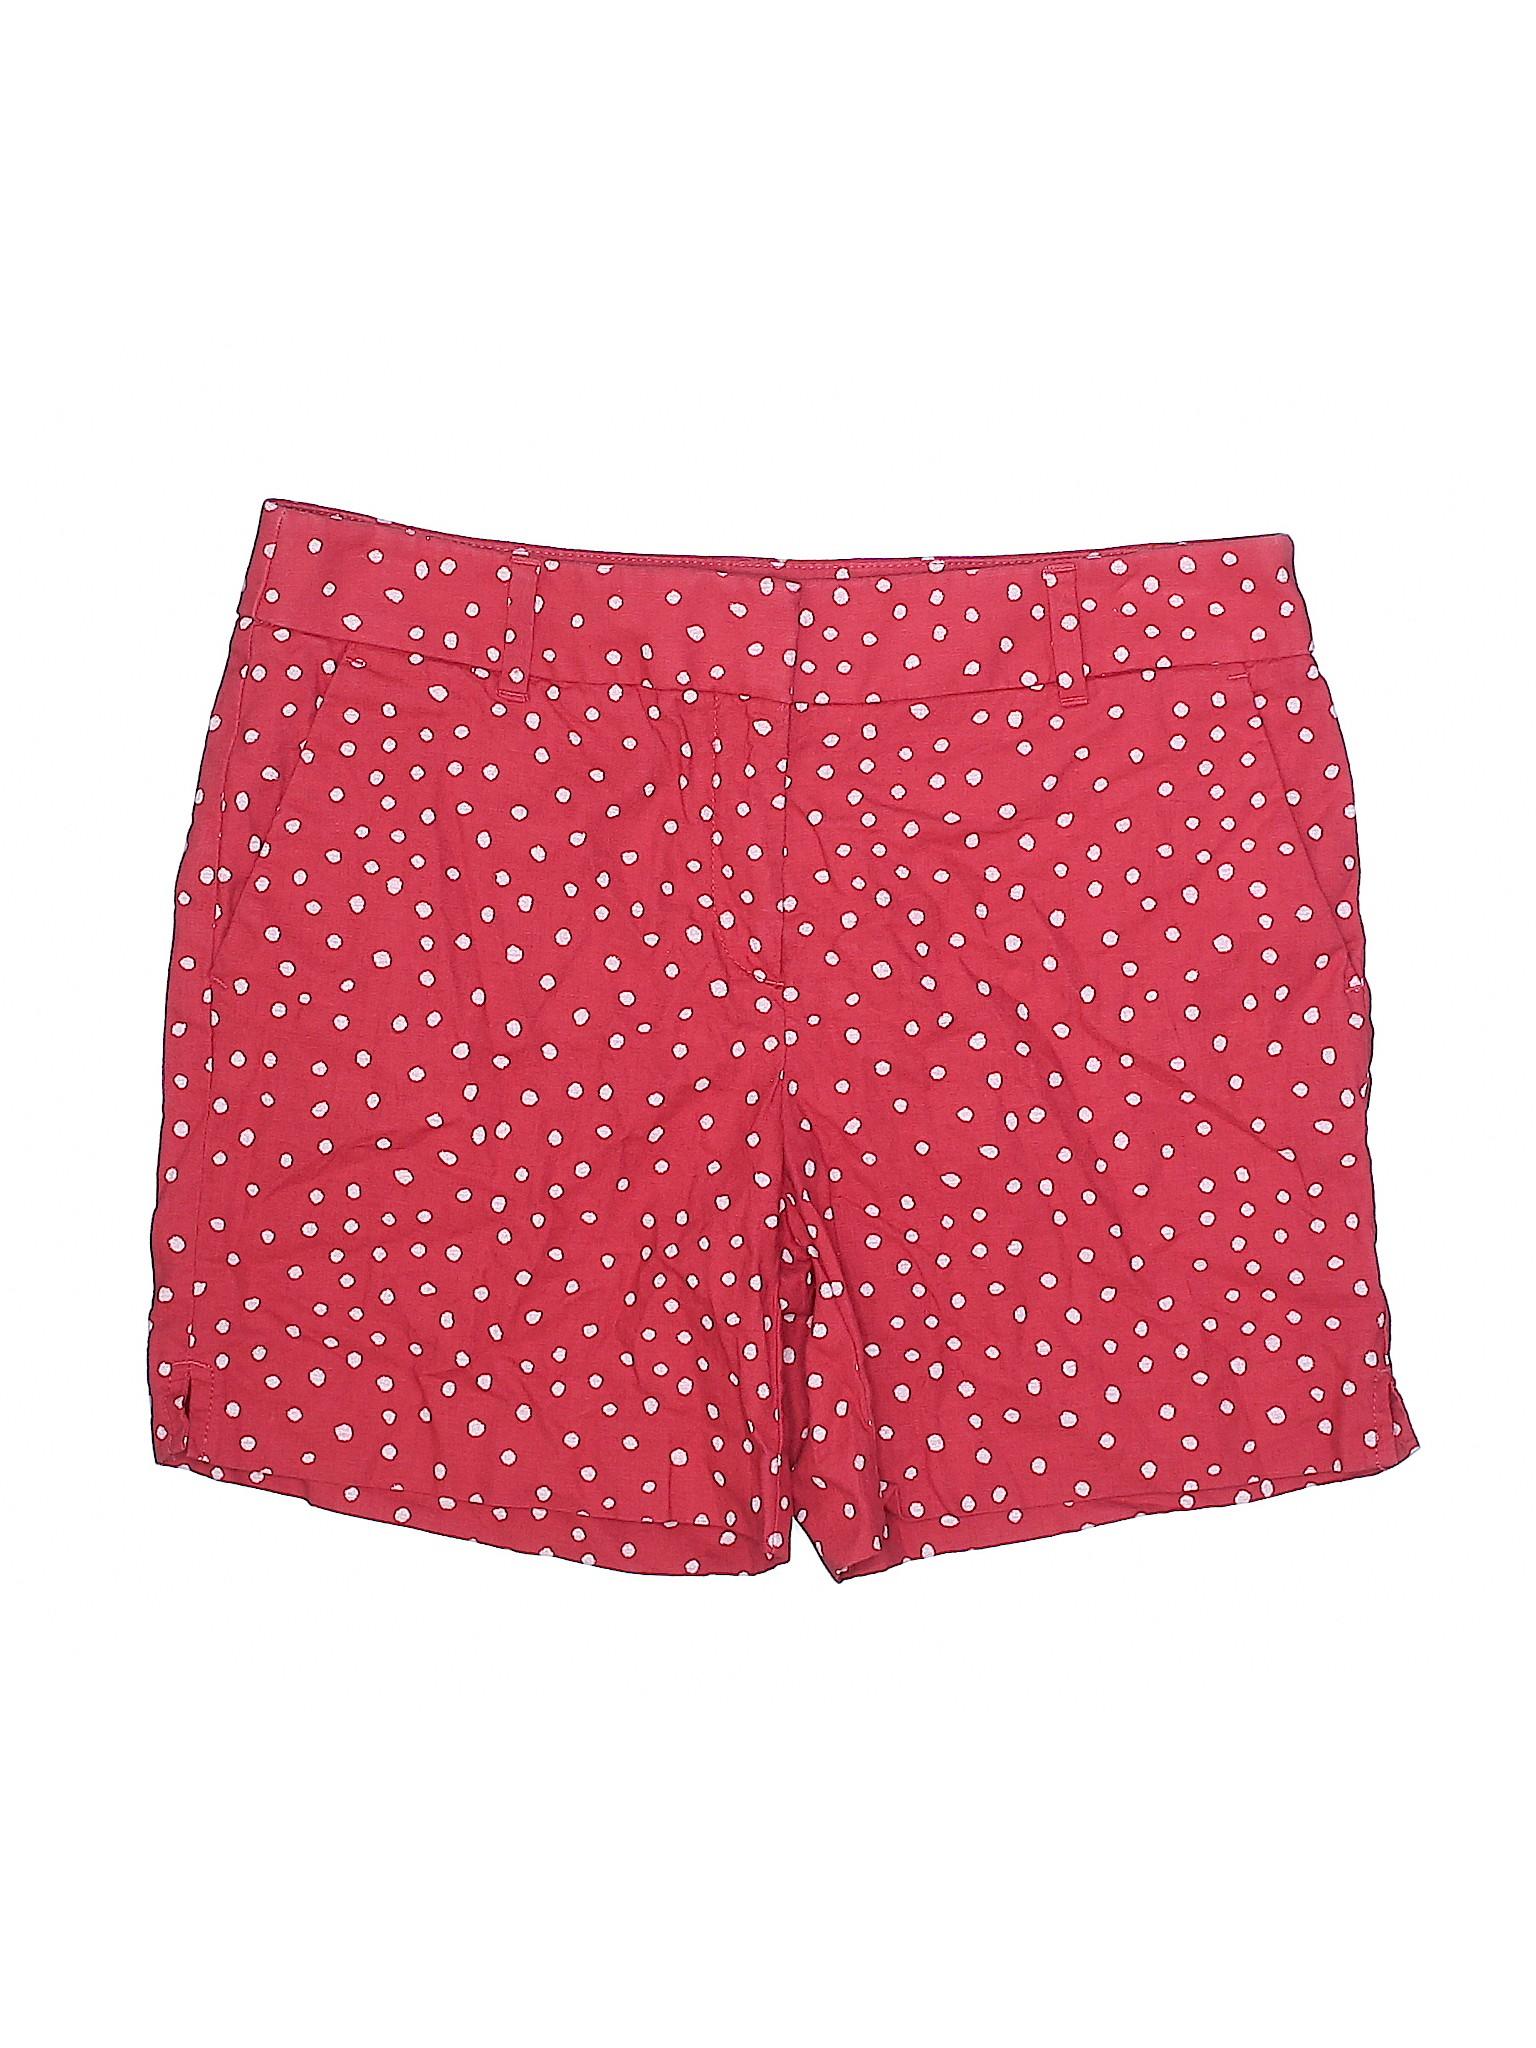 winter Shorts LOFT Ann Leisure Taylor dwaZn8qx